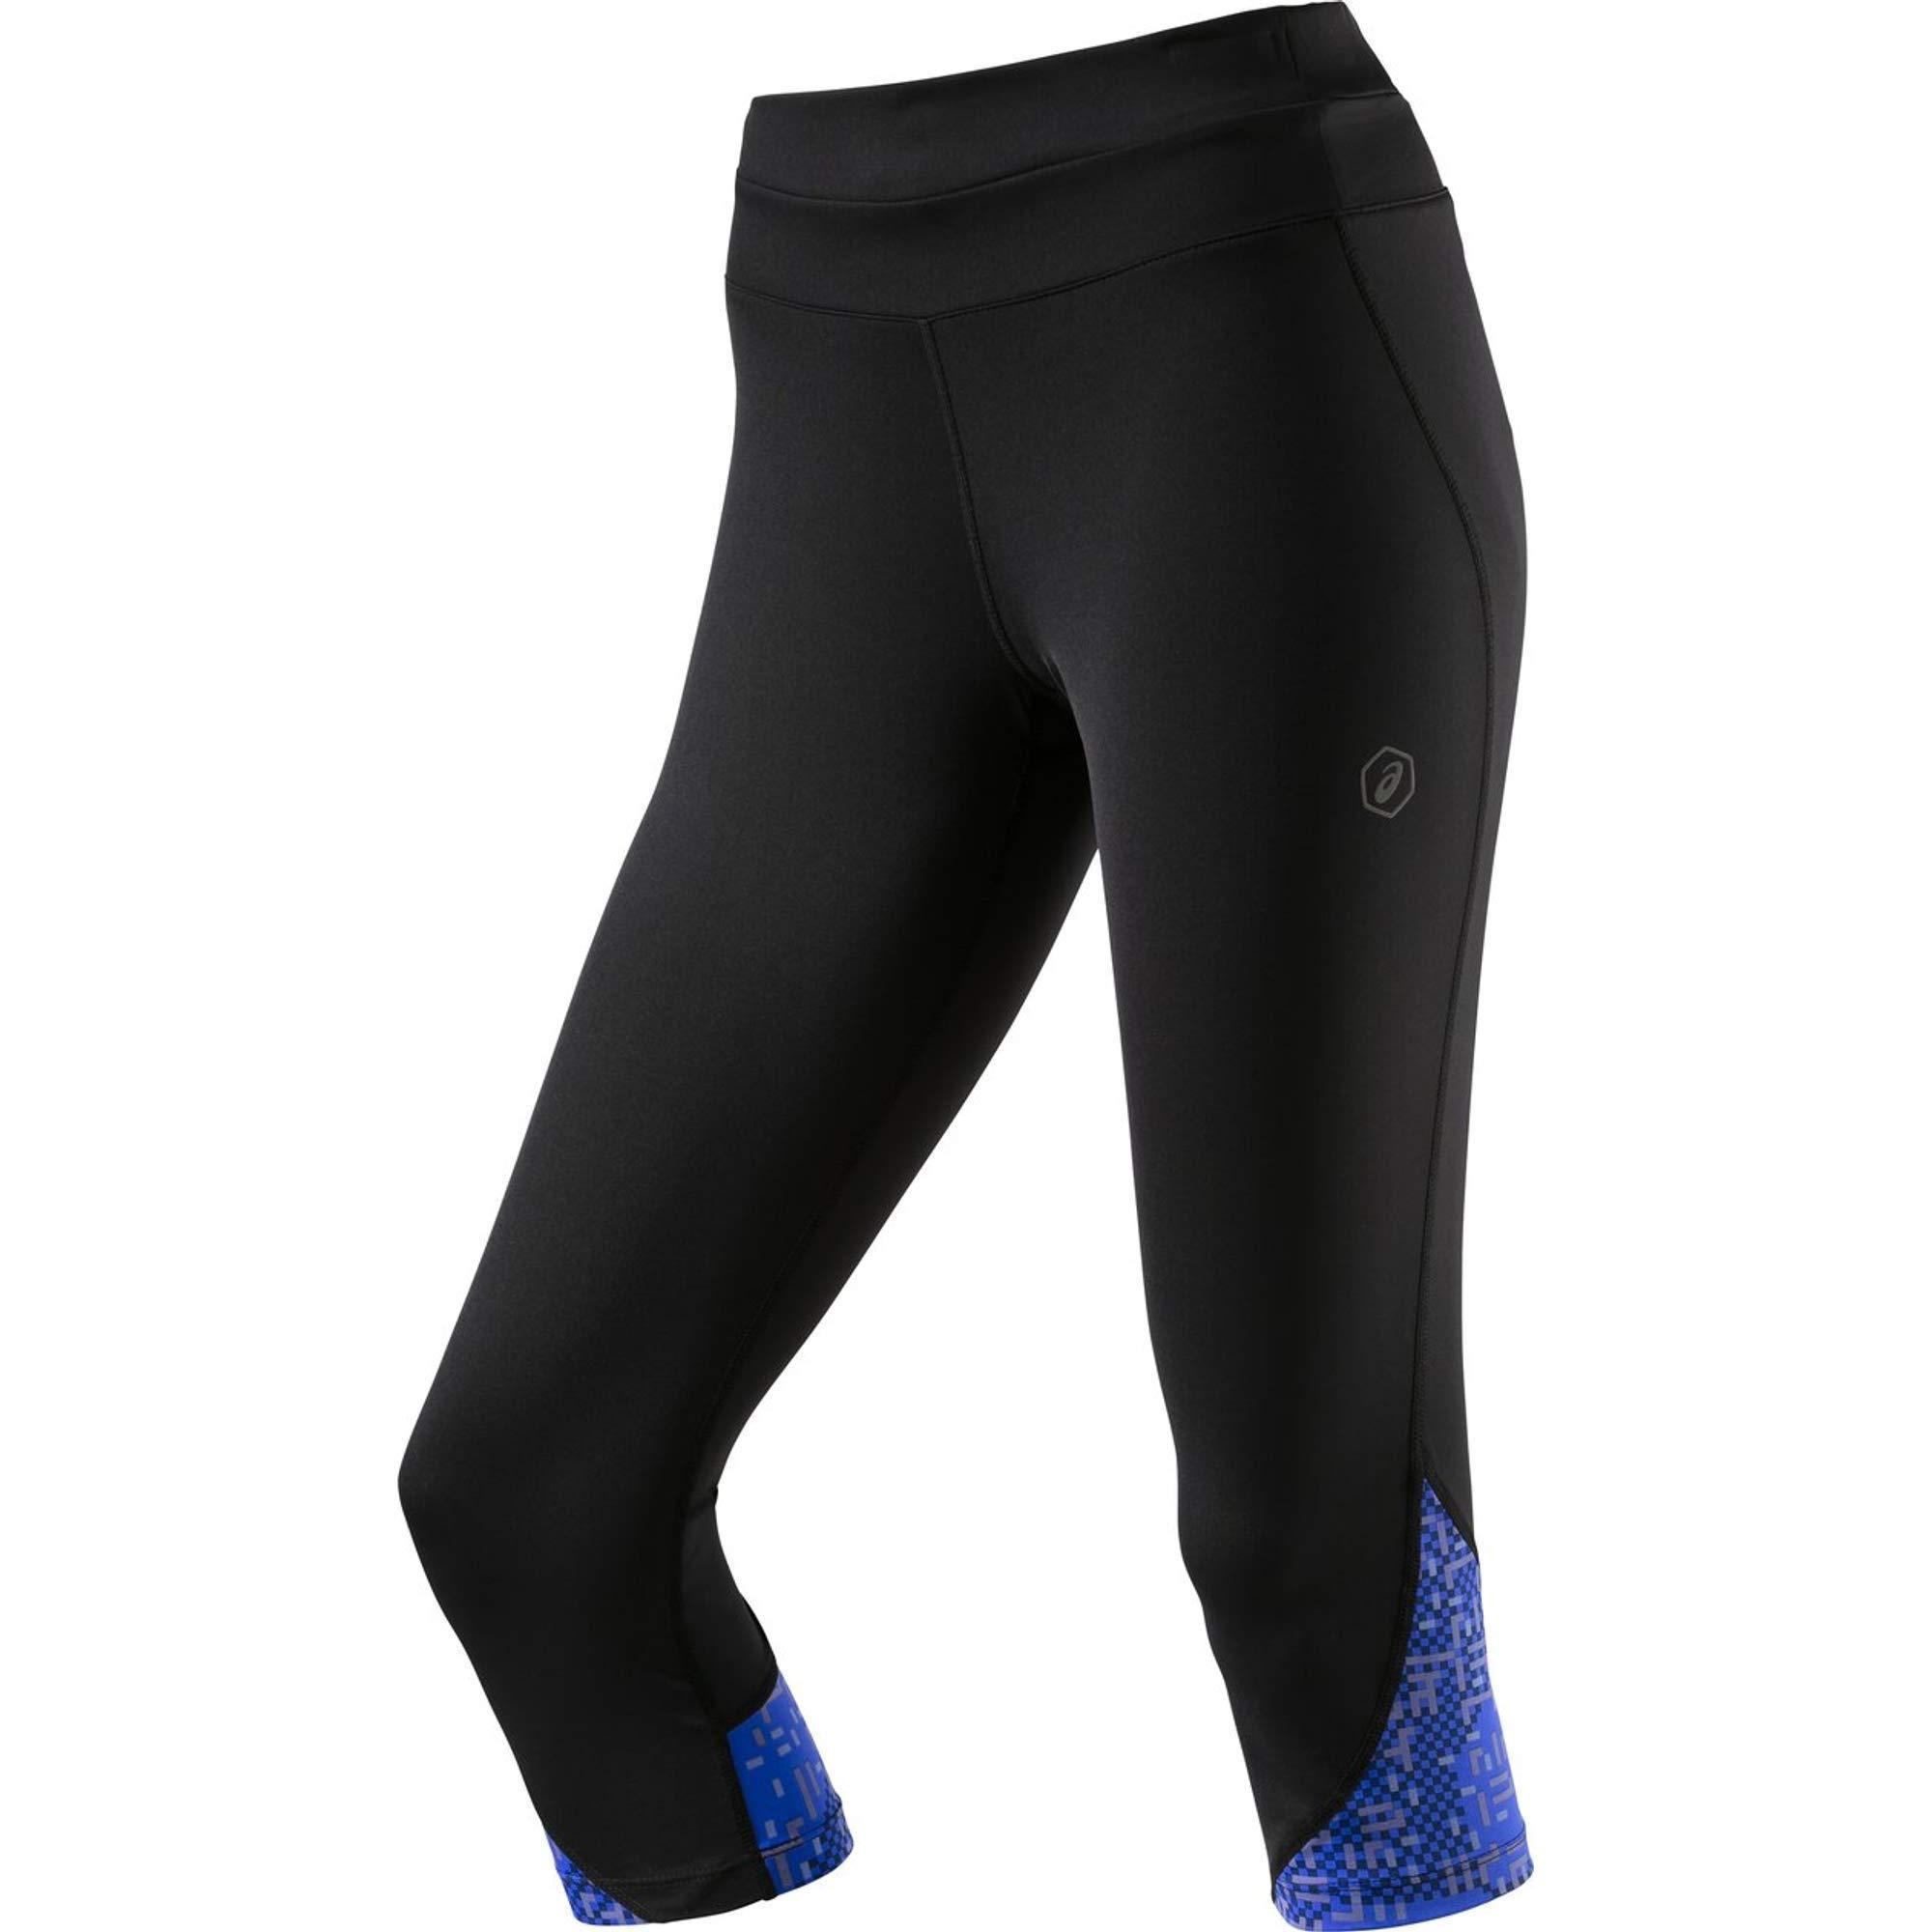 ASICS Damen Race Knee Tights, Performance Black/Lite Stripe, XS